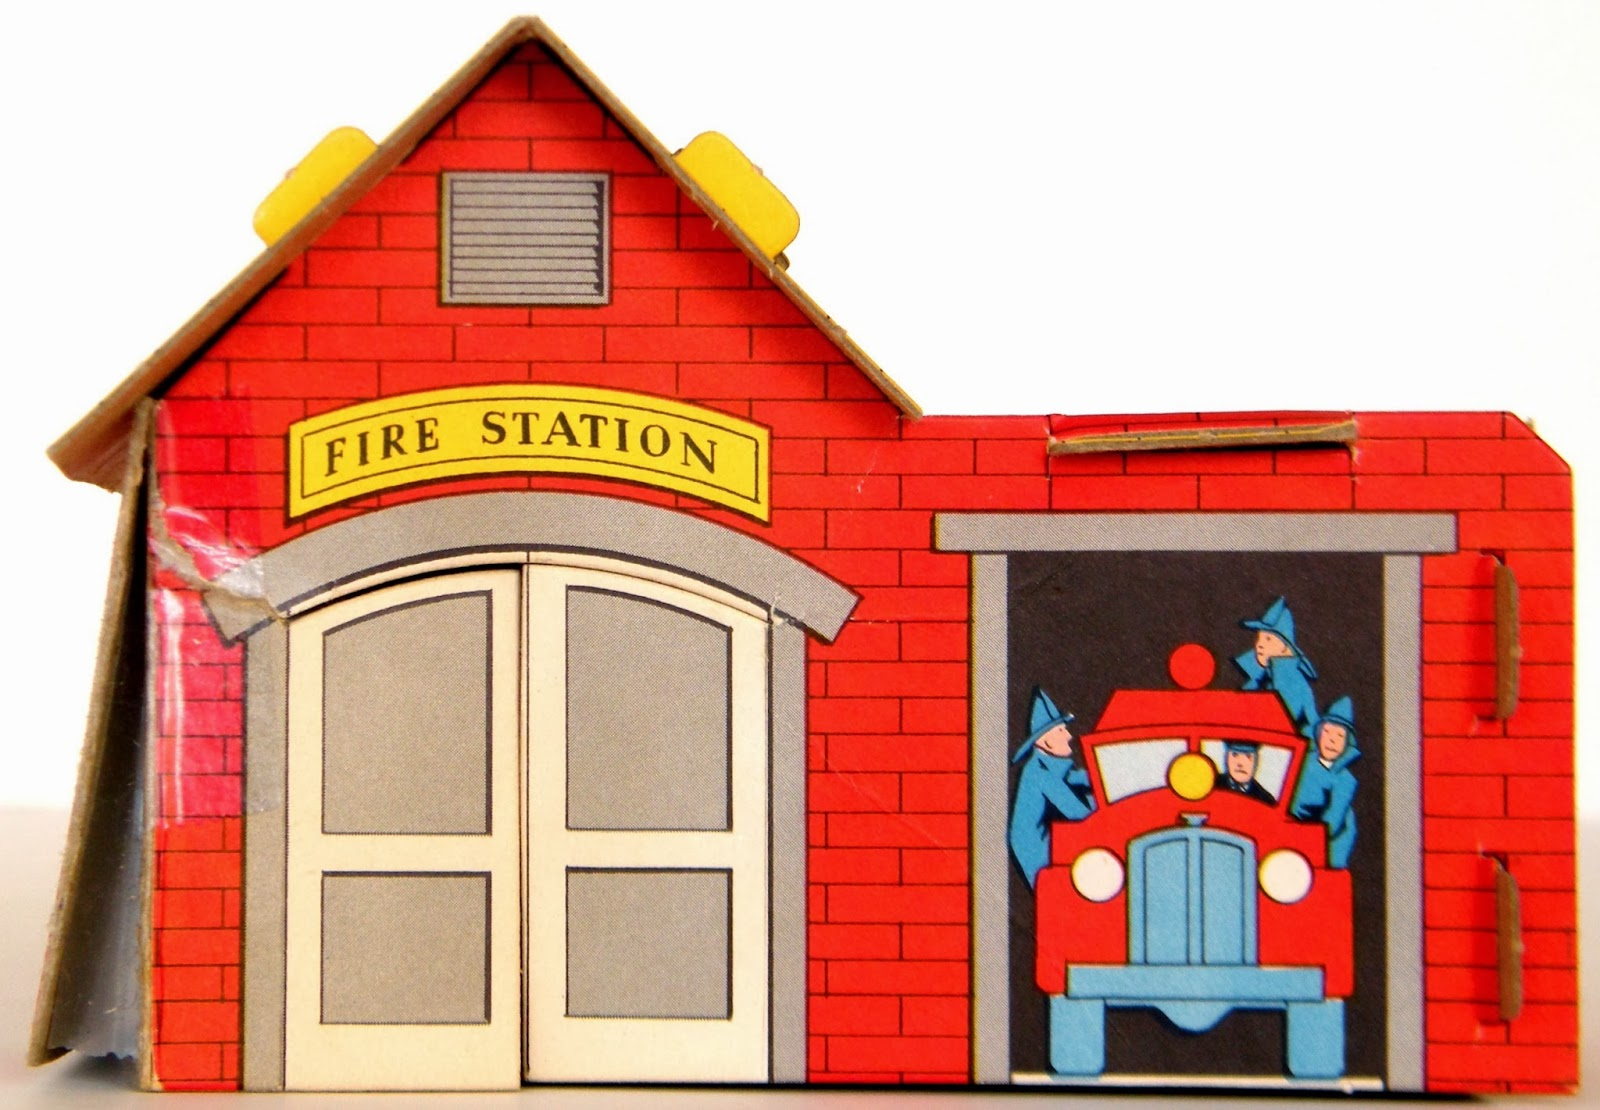 Firefighter clipart fire hall. Free cartoon firehouse download